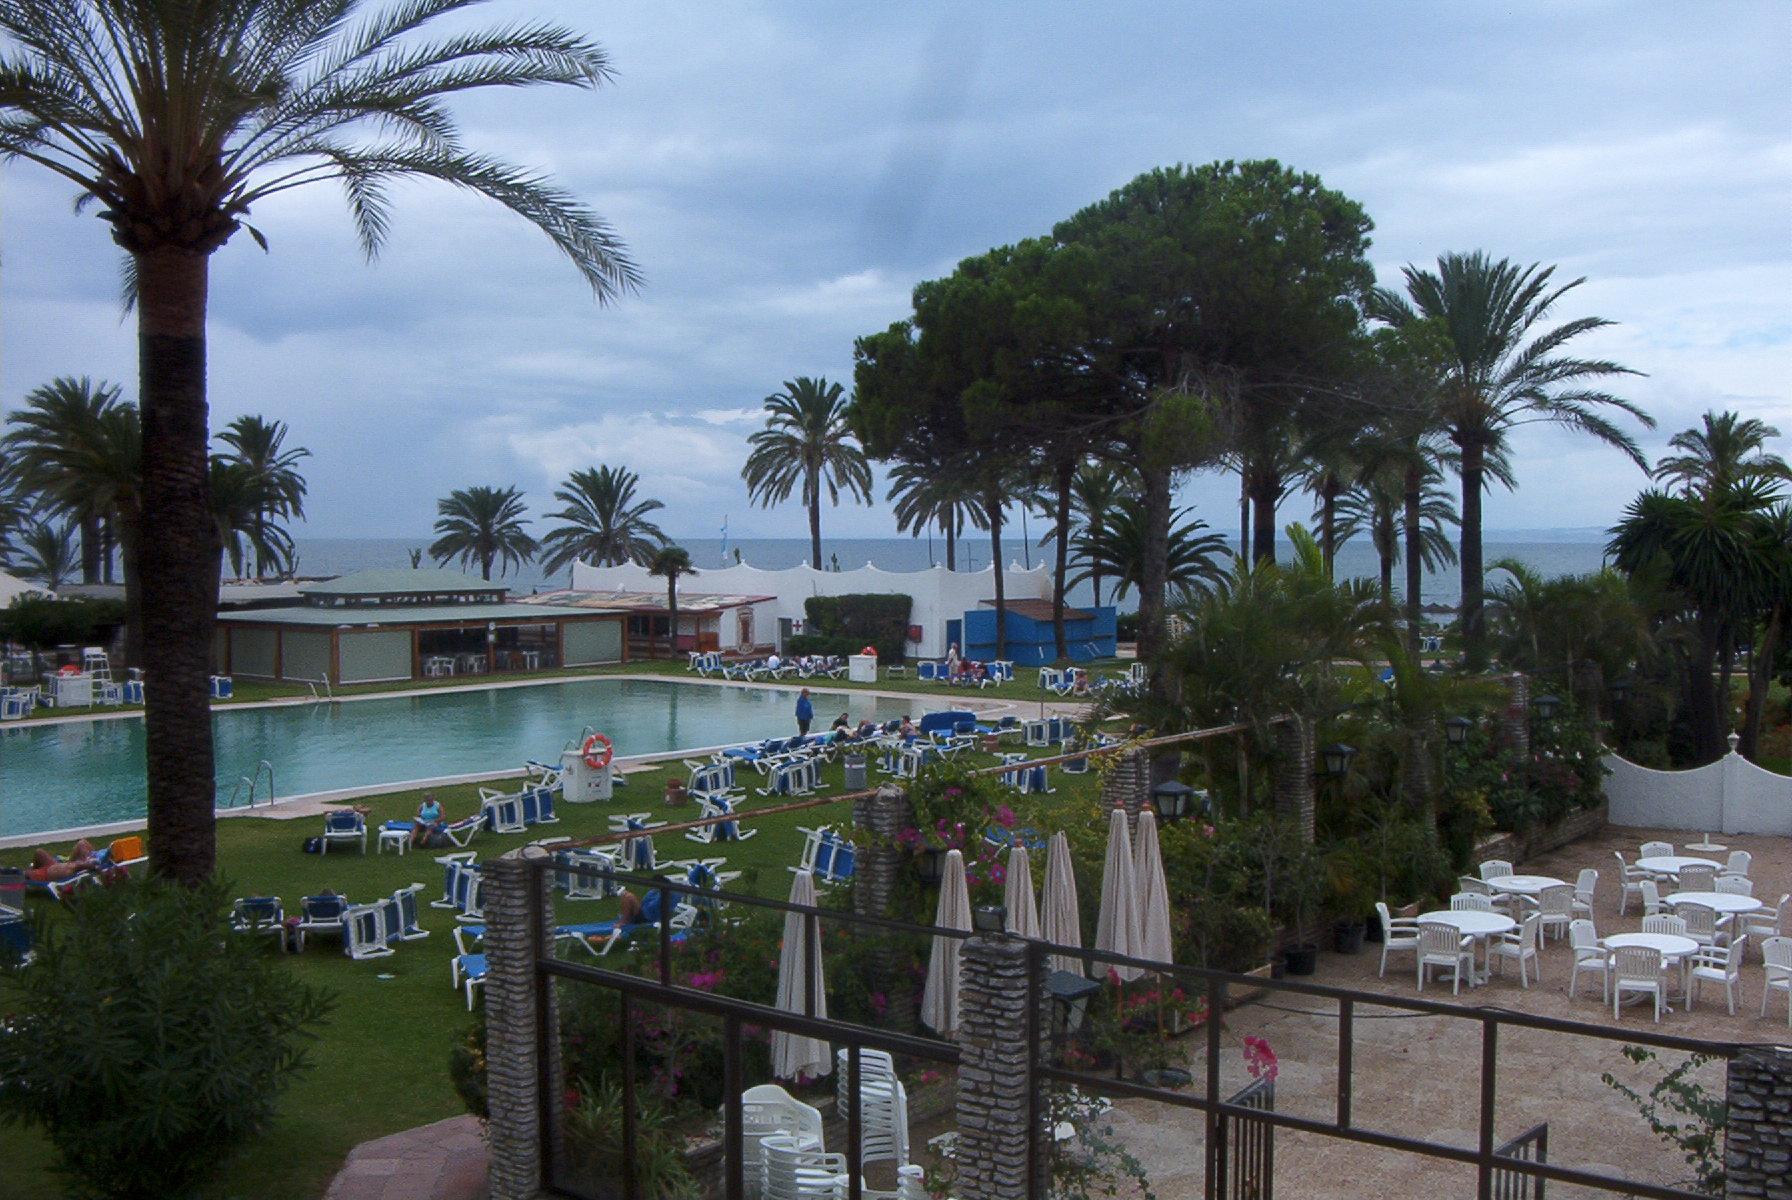 Foto playa Casasola / Isdabe-Atalaya / Matas Verdes. Hotel Atalaya Park,  Estepona